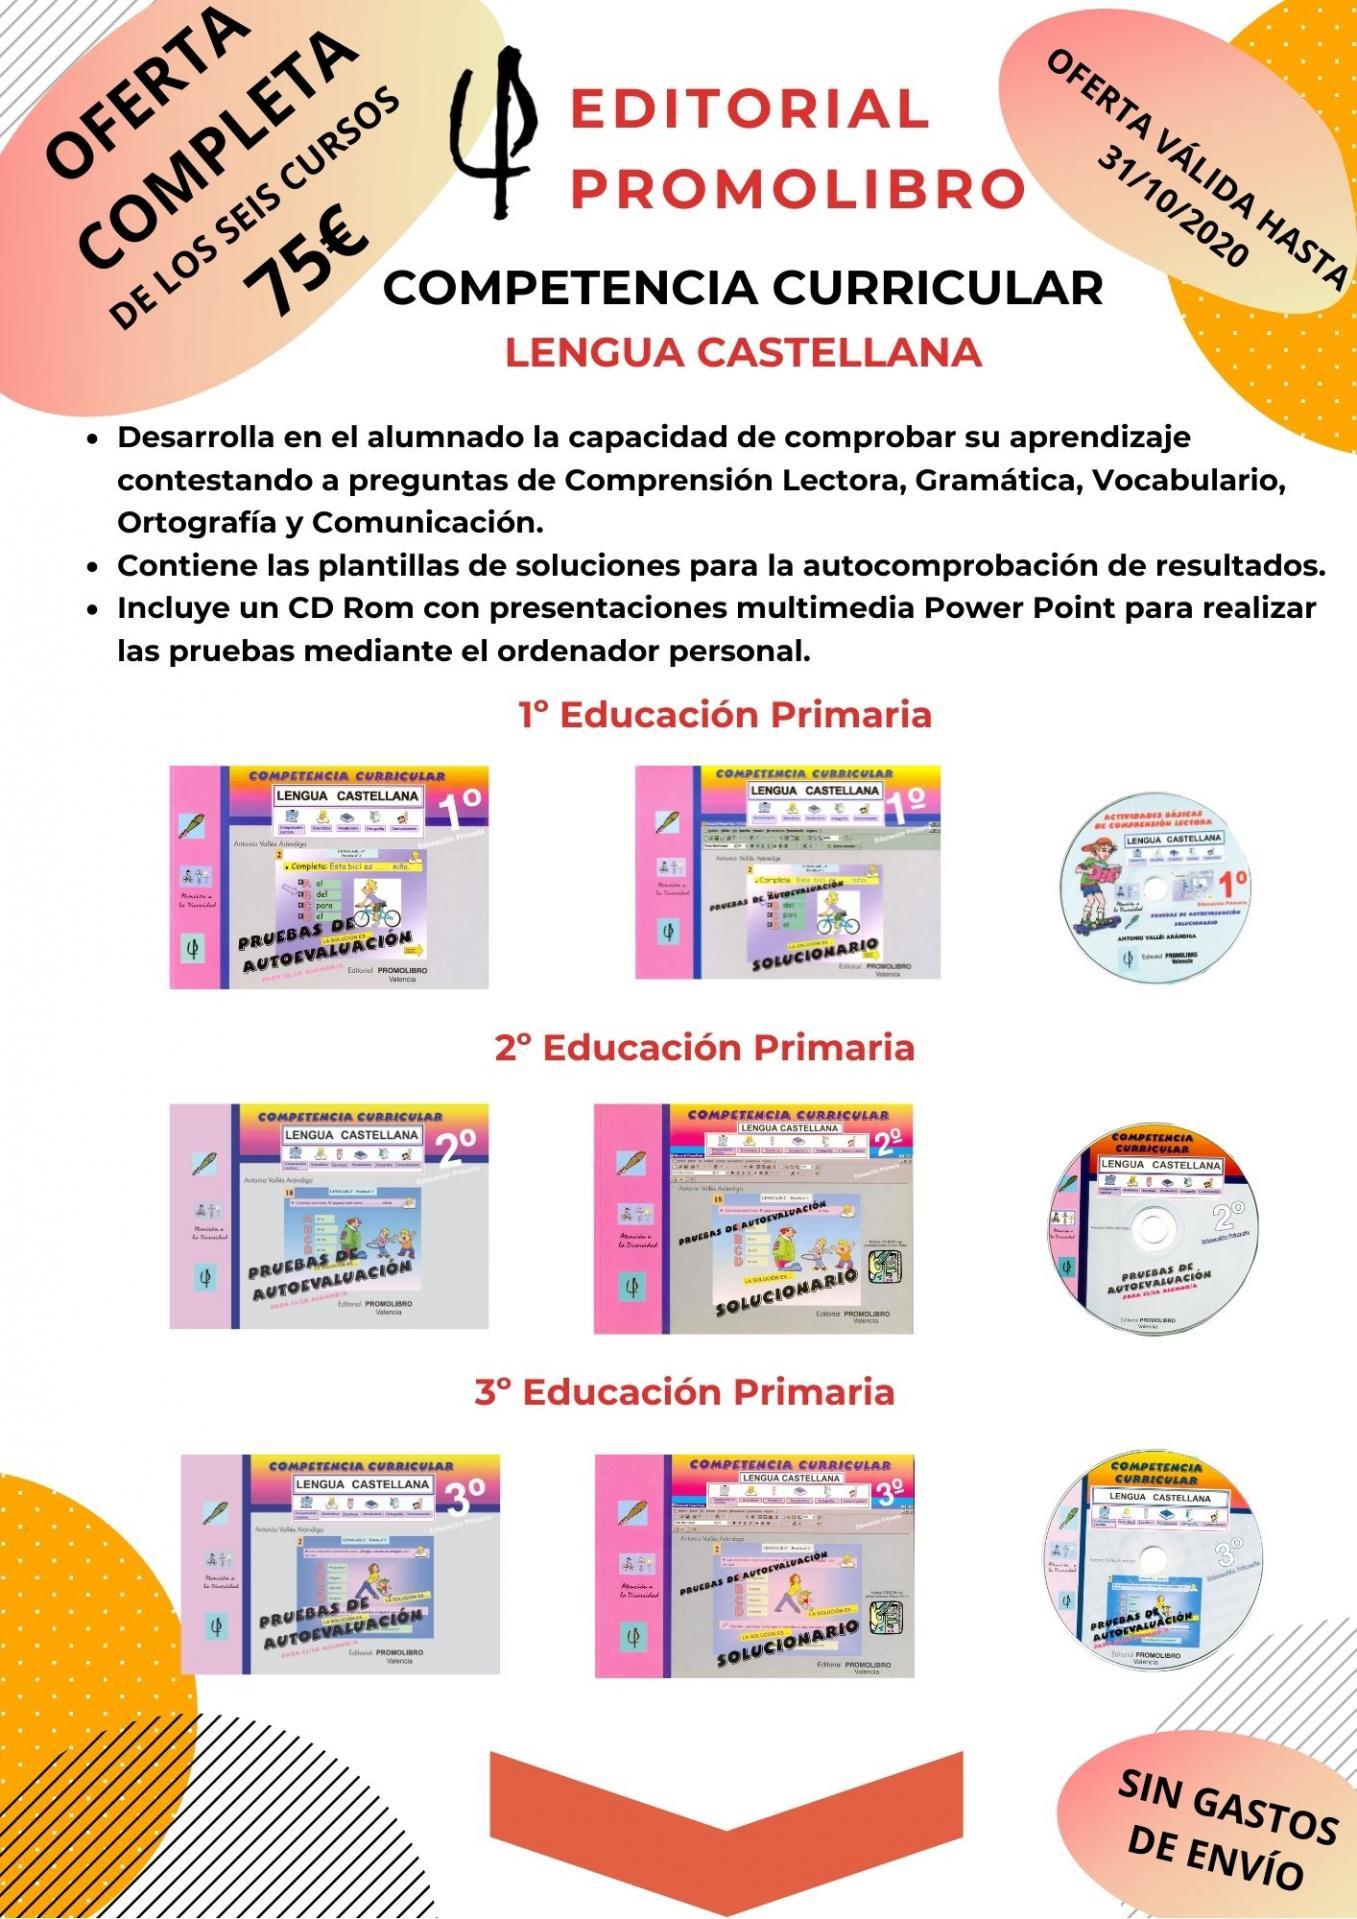 OFERTA. COMPETENCIA CURRICULAR LENGUA CASTELLANA